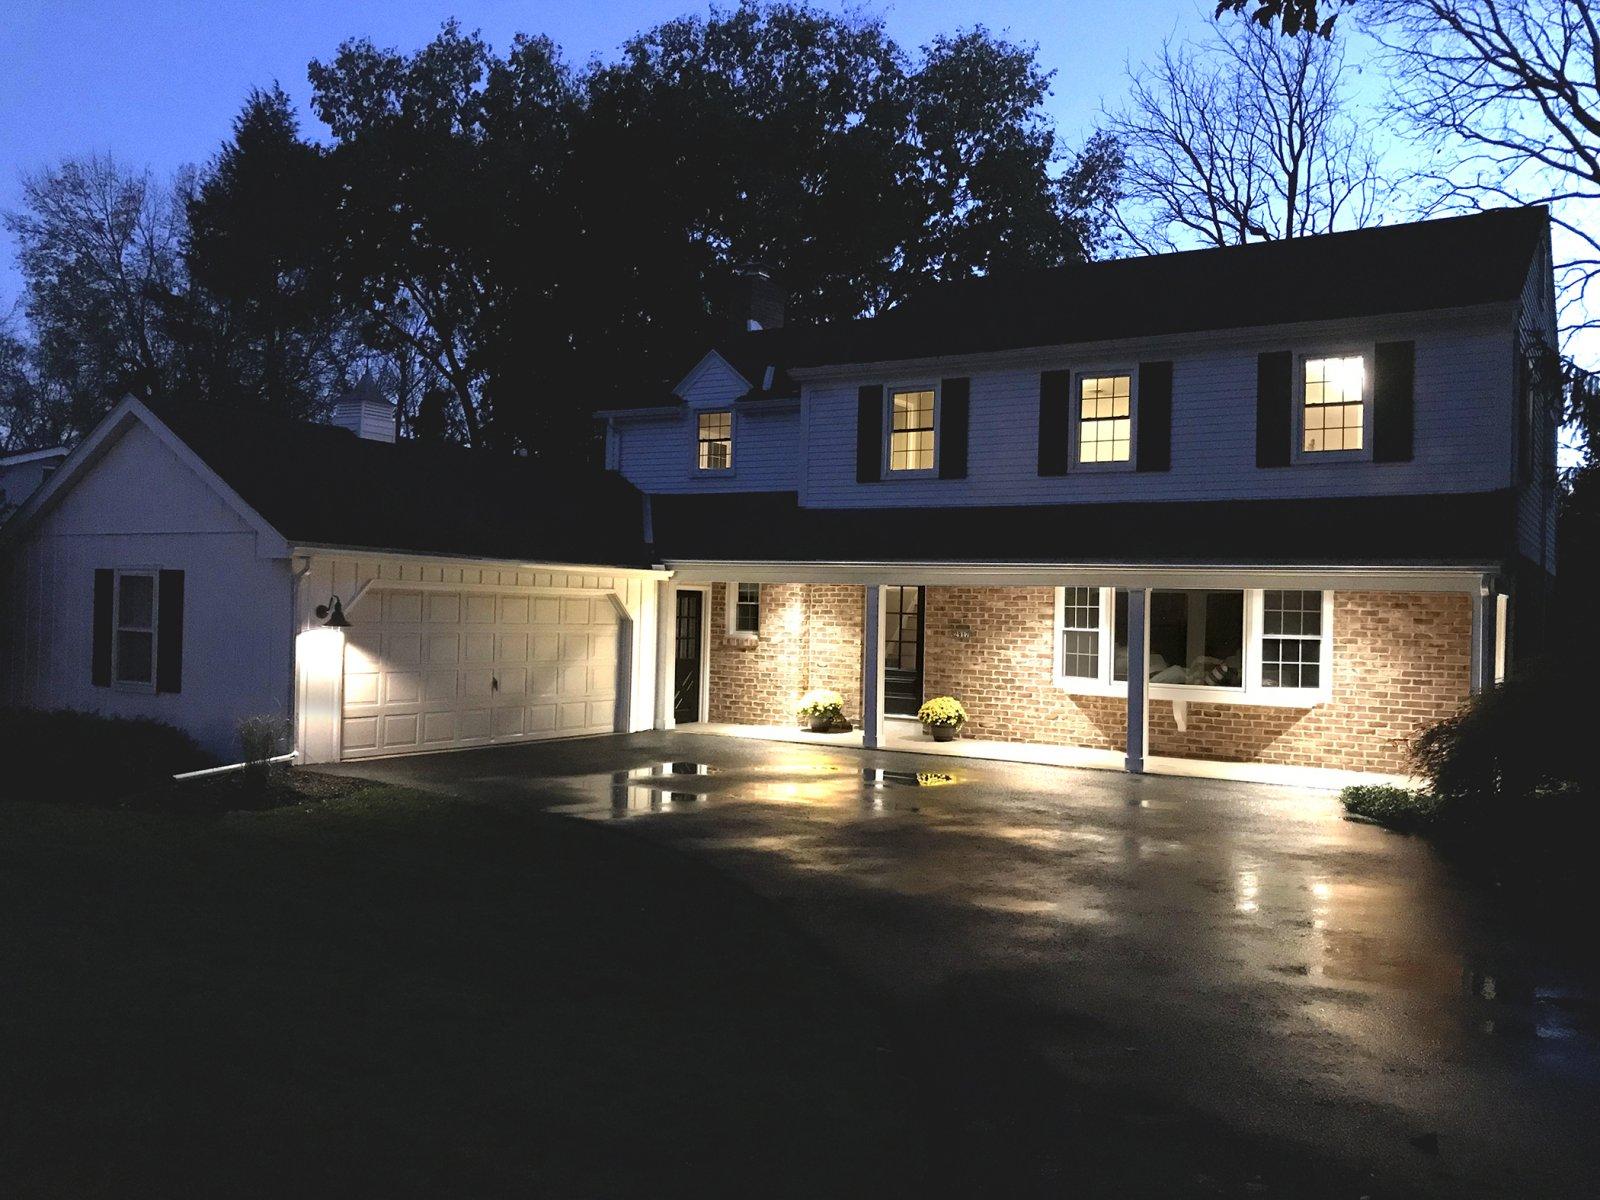 Renovation in Allentown, PA